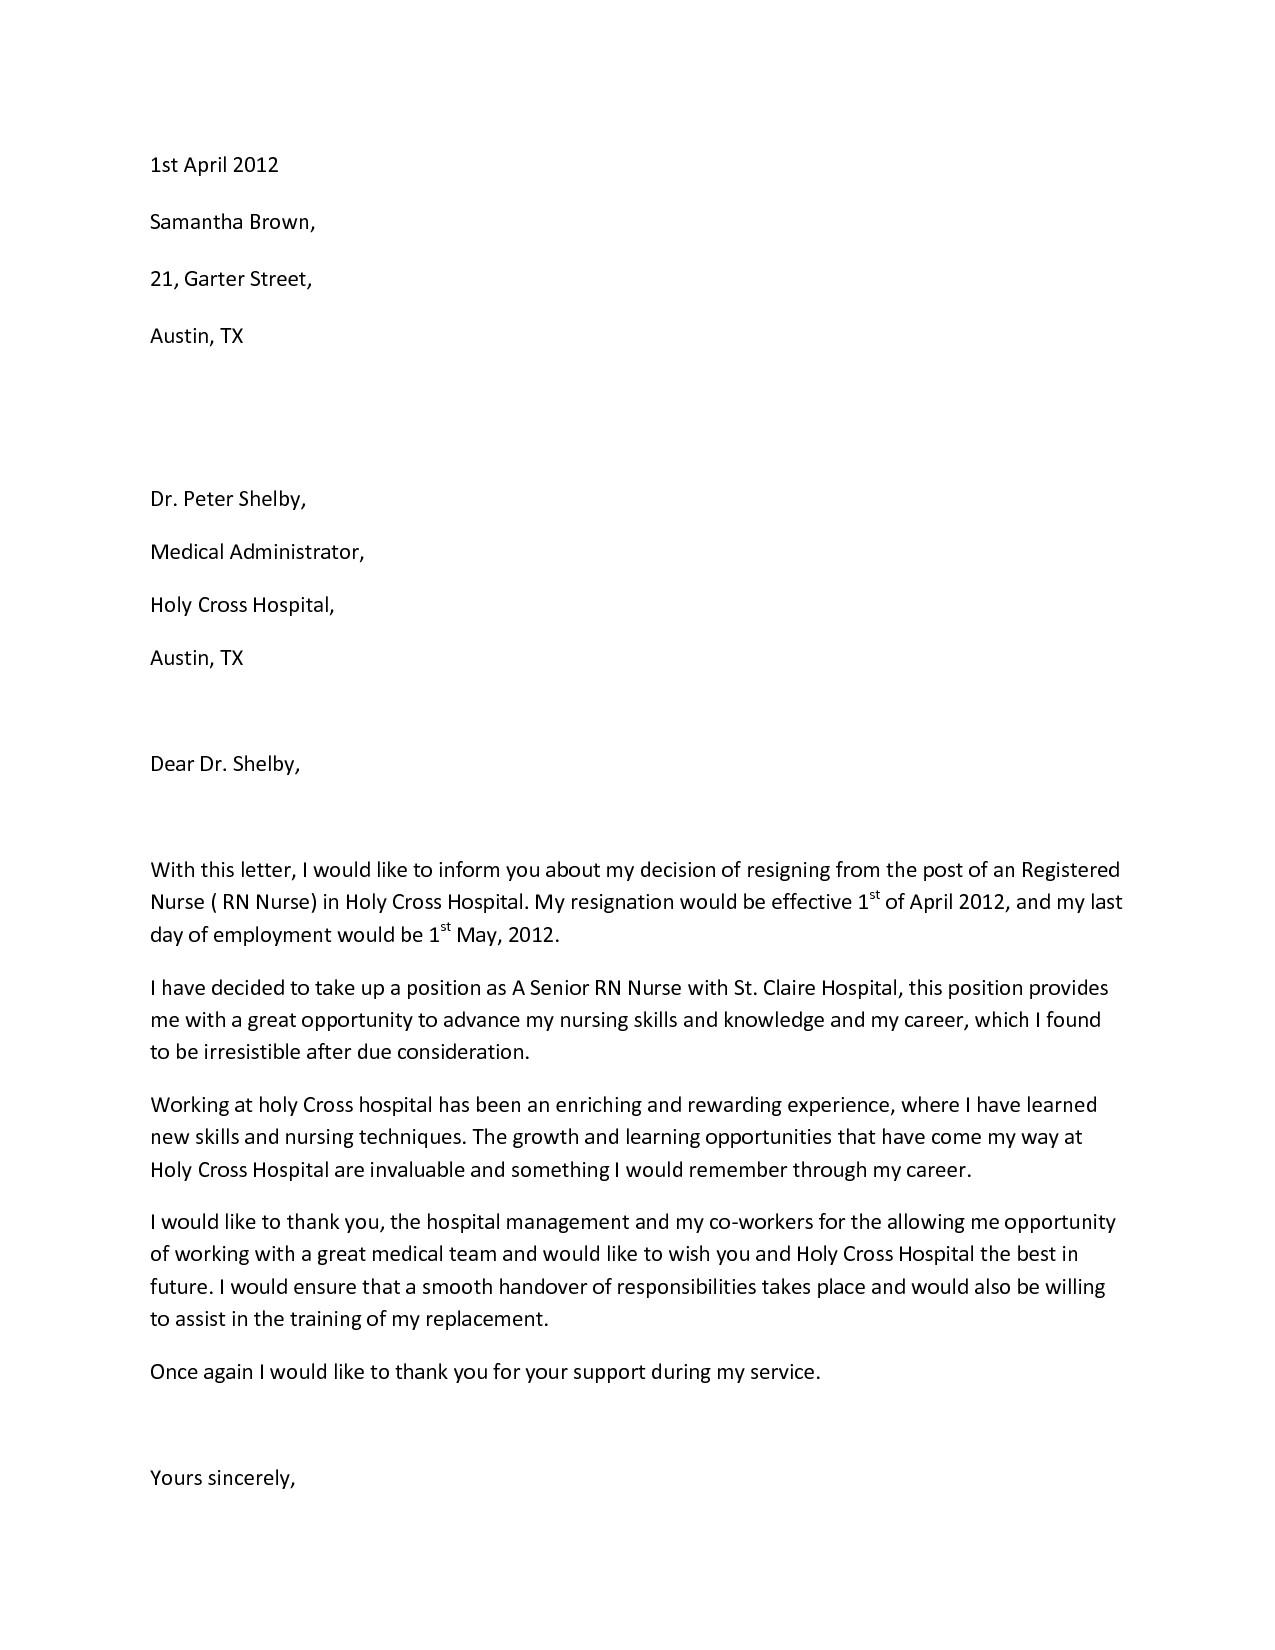 Sample Resignation Letter Nurse Doc Nursing Resignation Letters Sample Nurse Letter